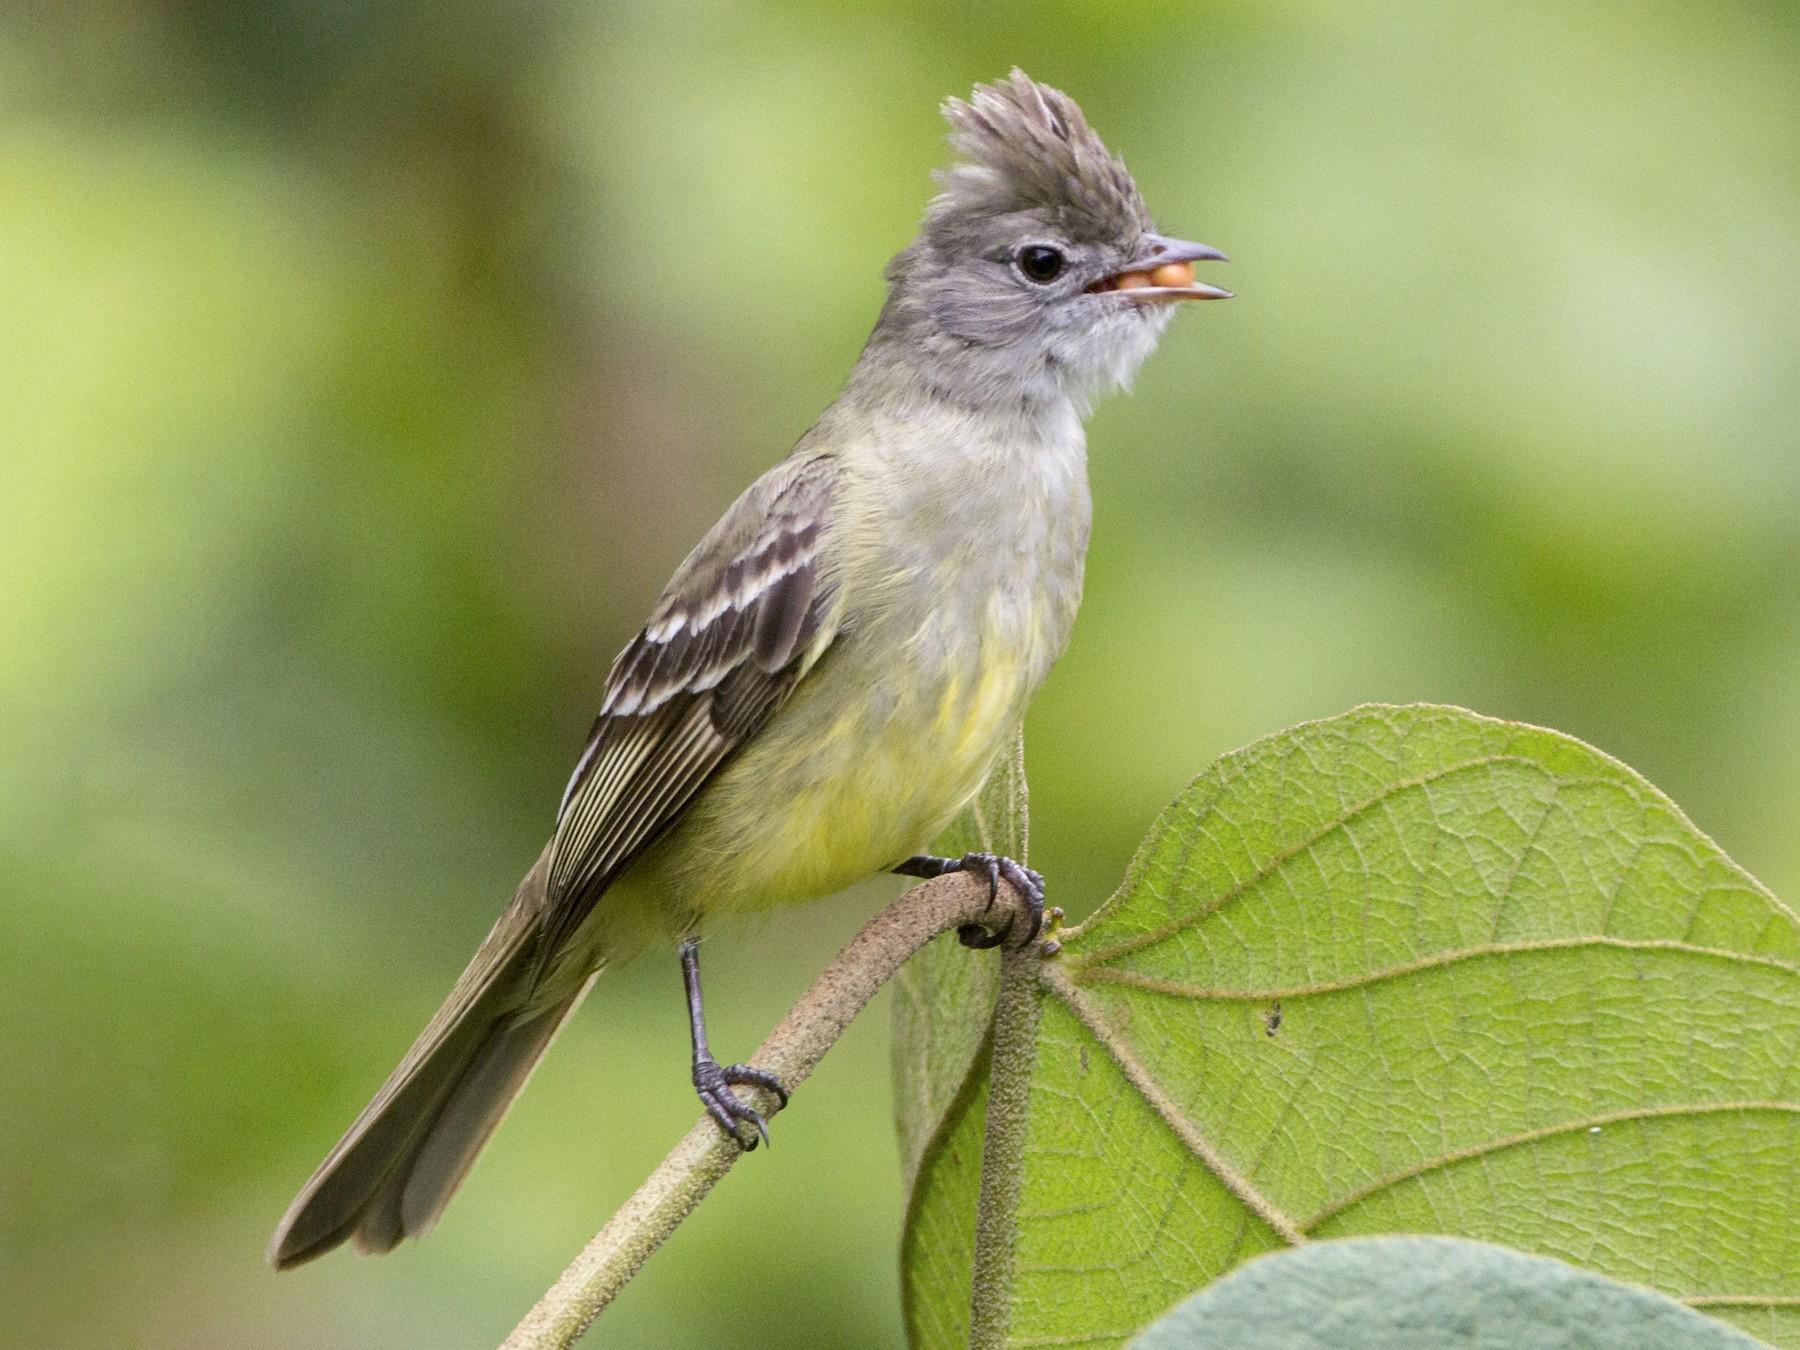 Yellow-bellied Elaenia - Pepe Castiblanco